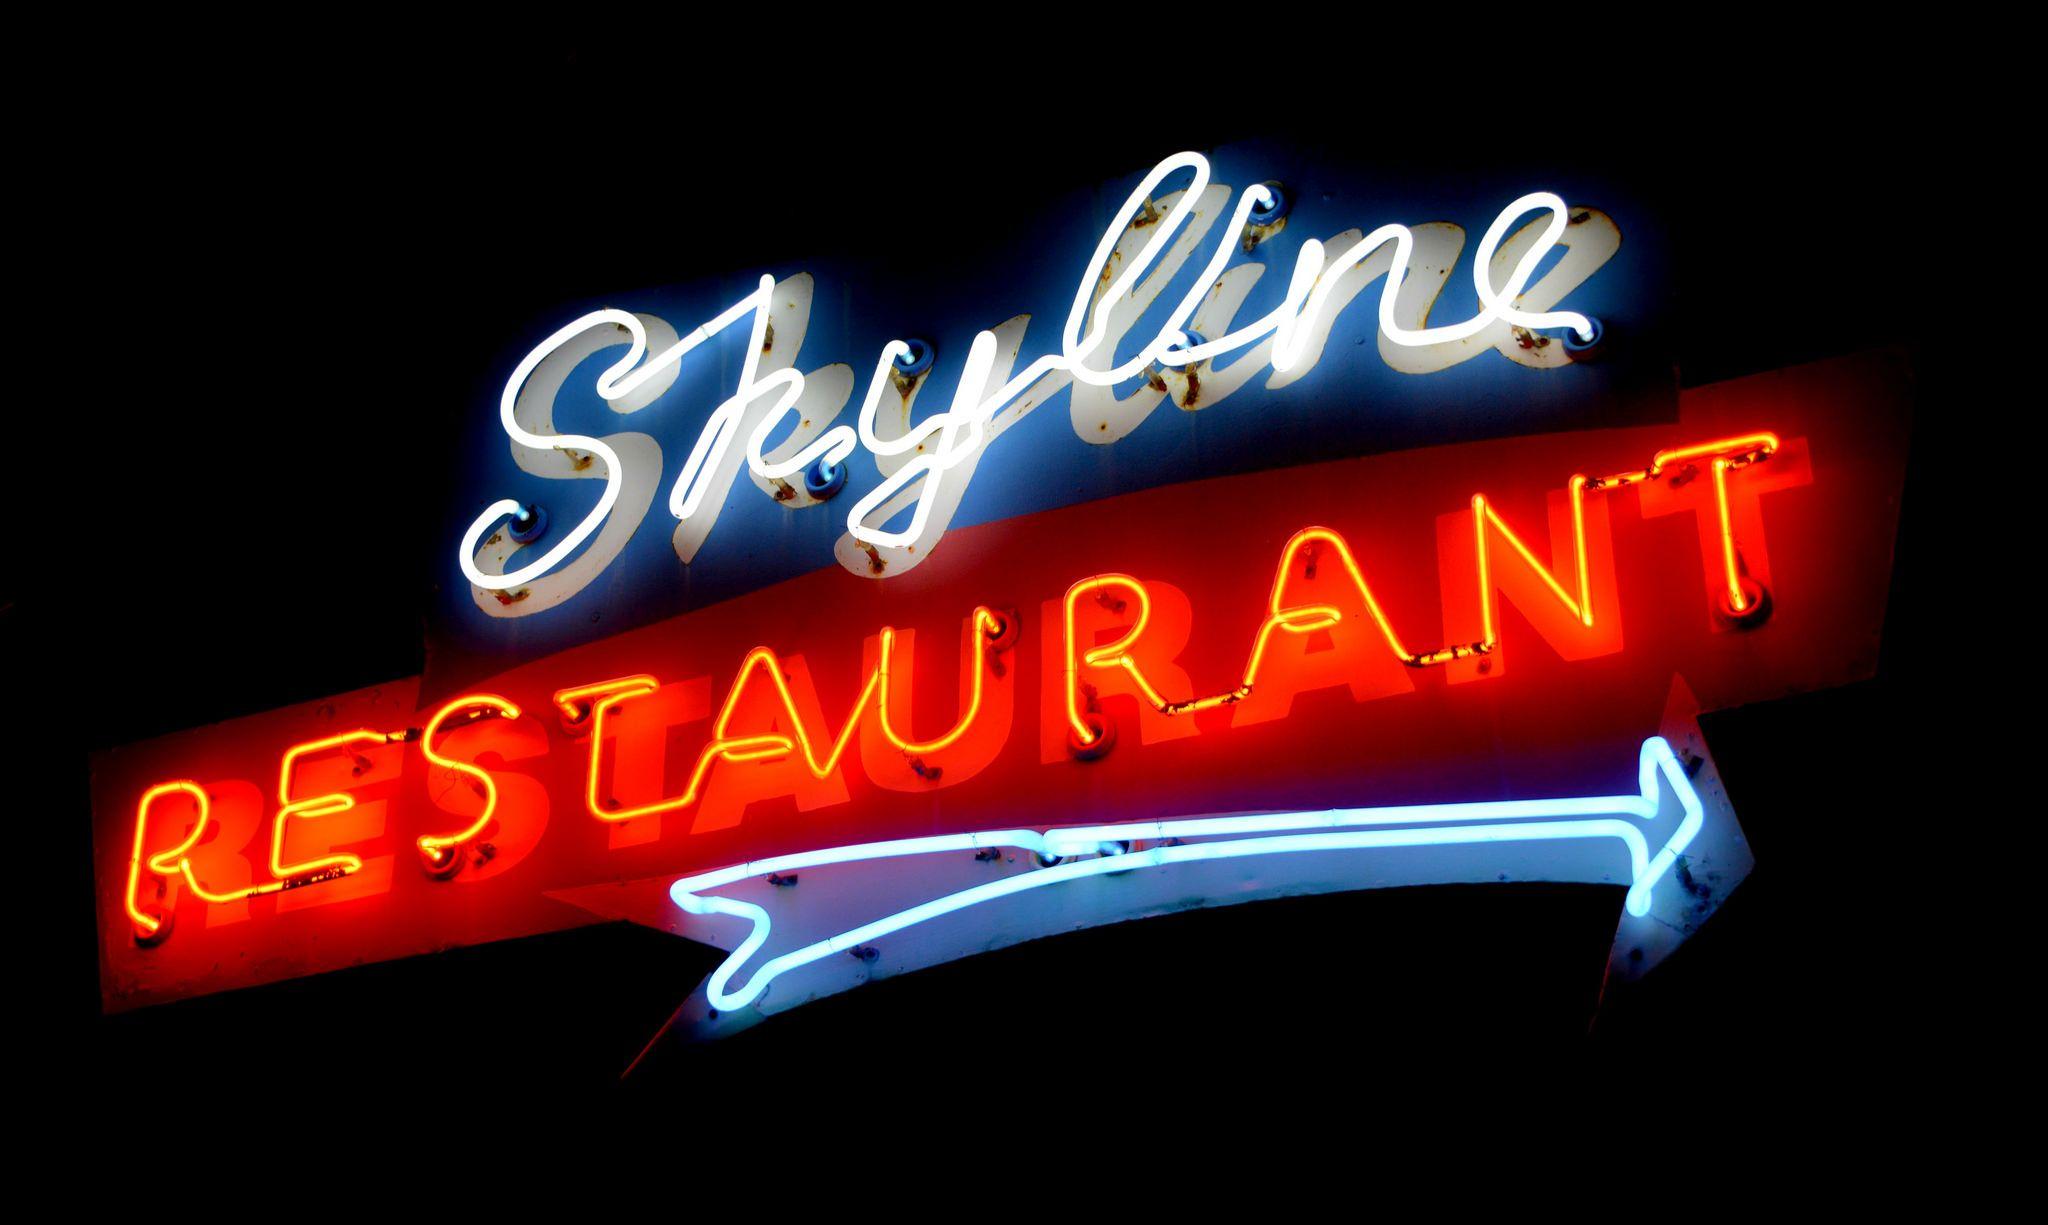 Skyline Restaurant Neon Sign Toronto Ontario Neon Signs Neon Vintage Restaurant